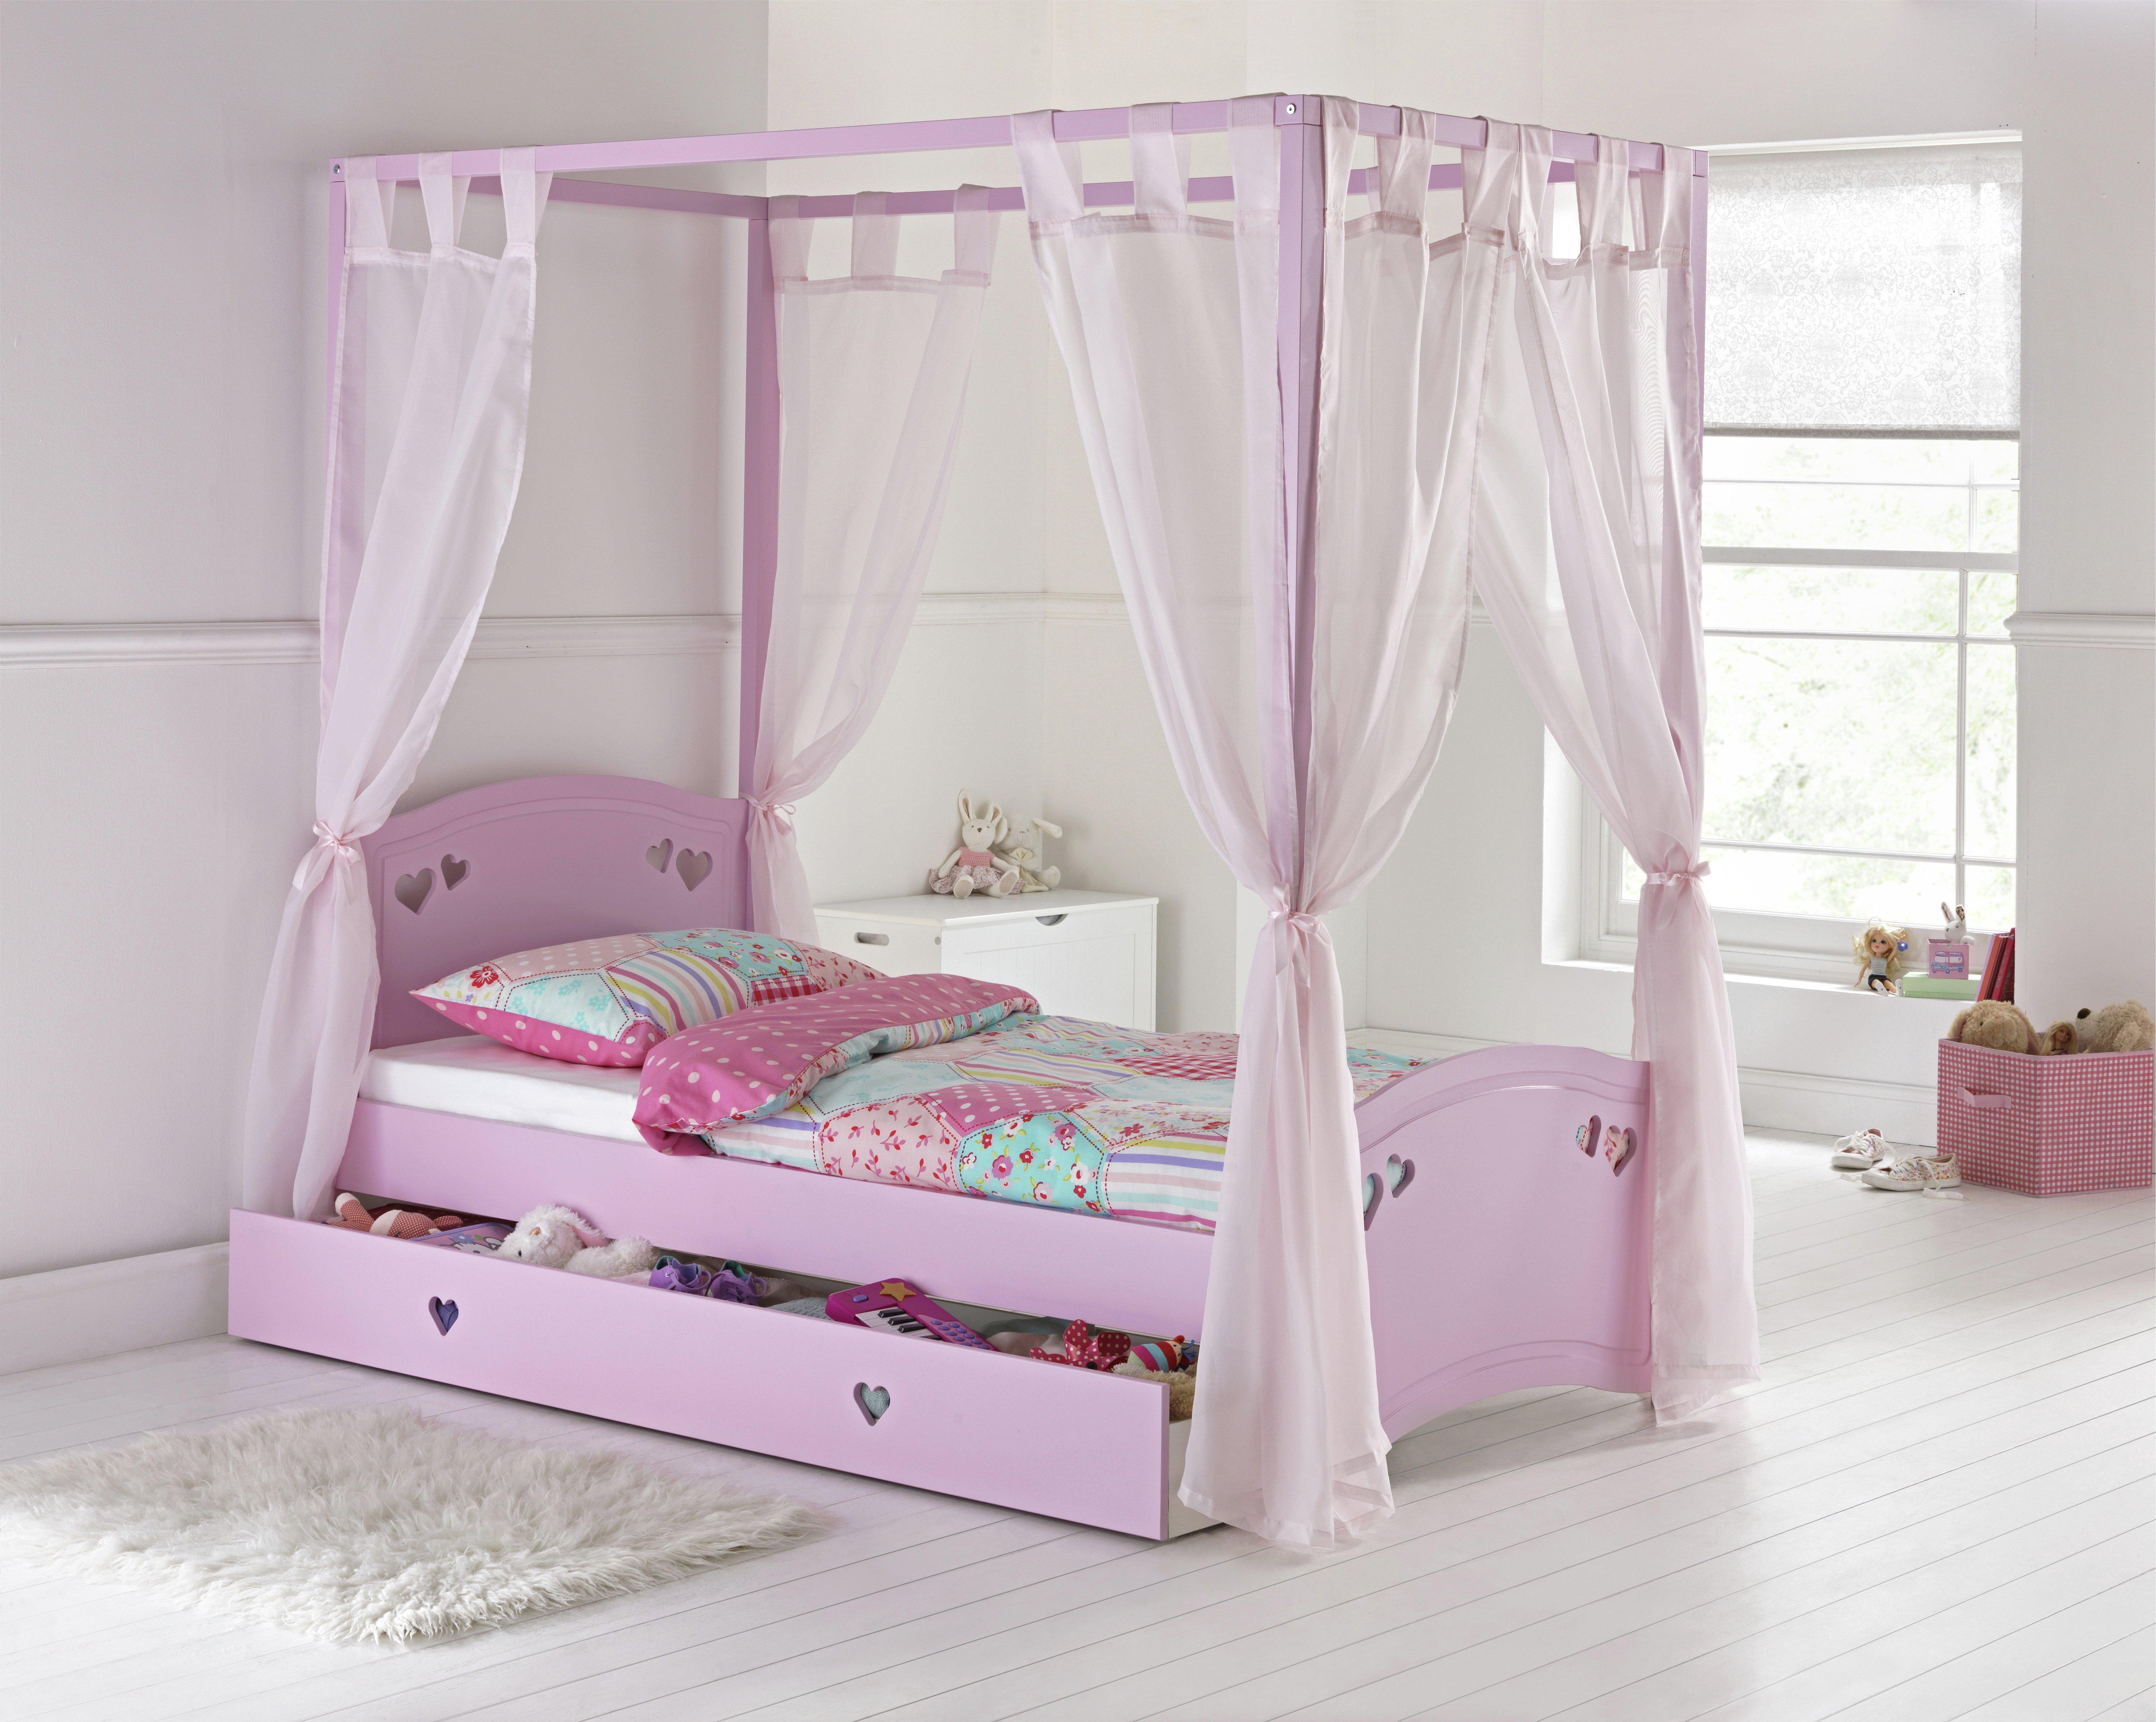 buy lindam bed rails and guards at your. Black Bedroom Furniture Sets. Home Design Ideas